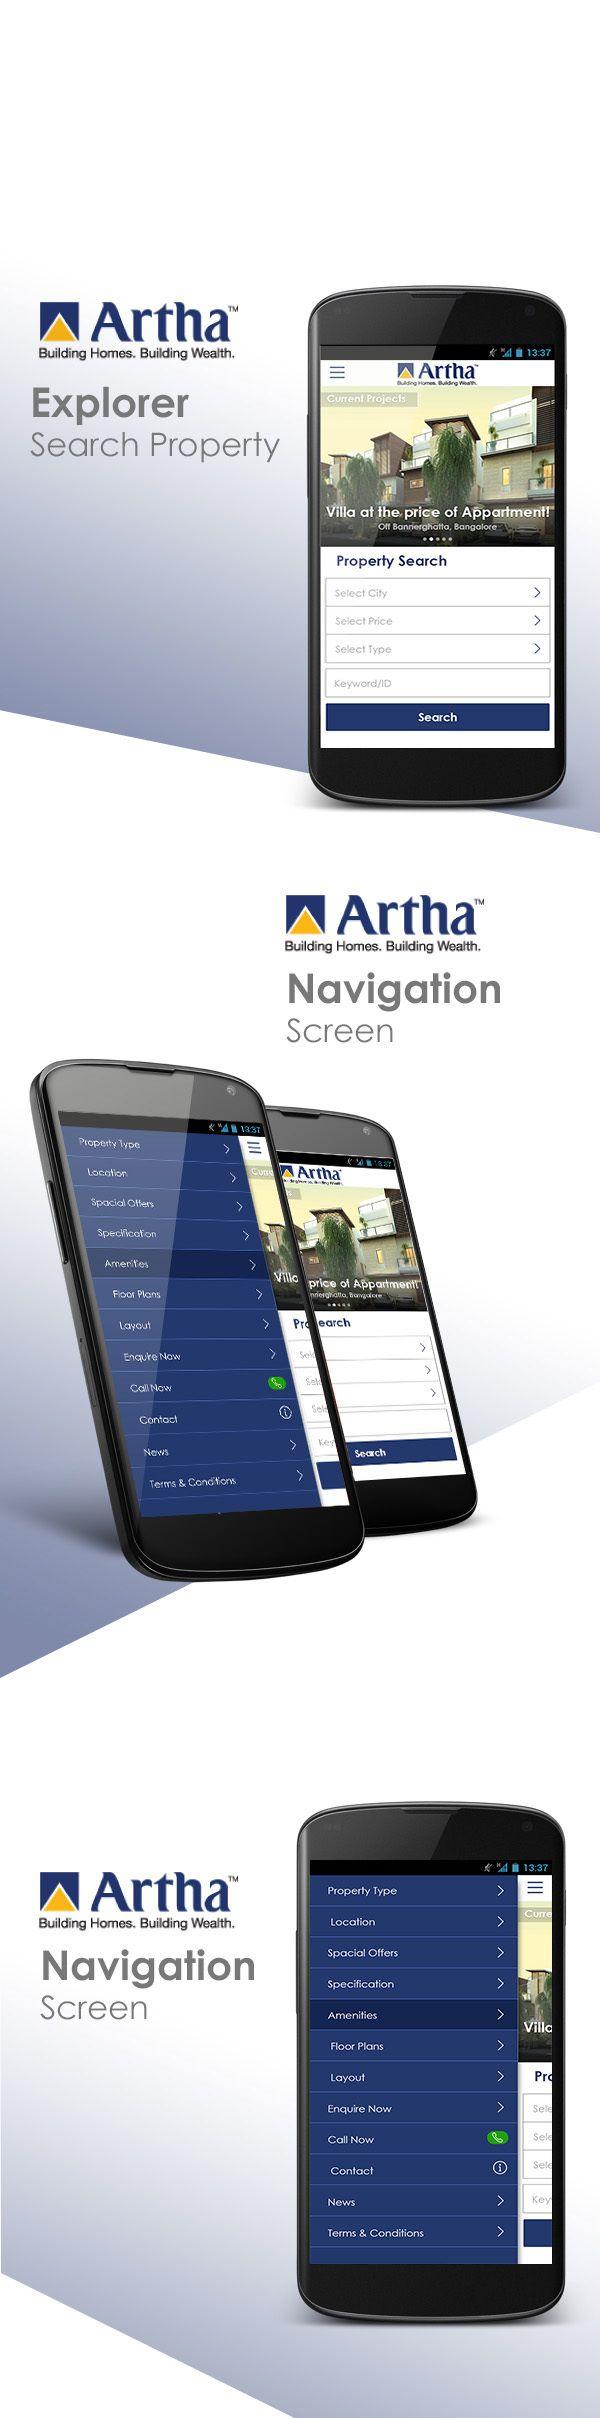 Aritha Developers by Sharan Surpur, via Behance